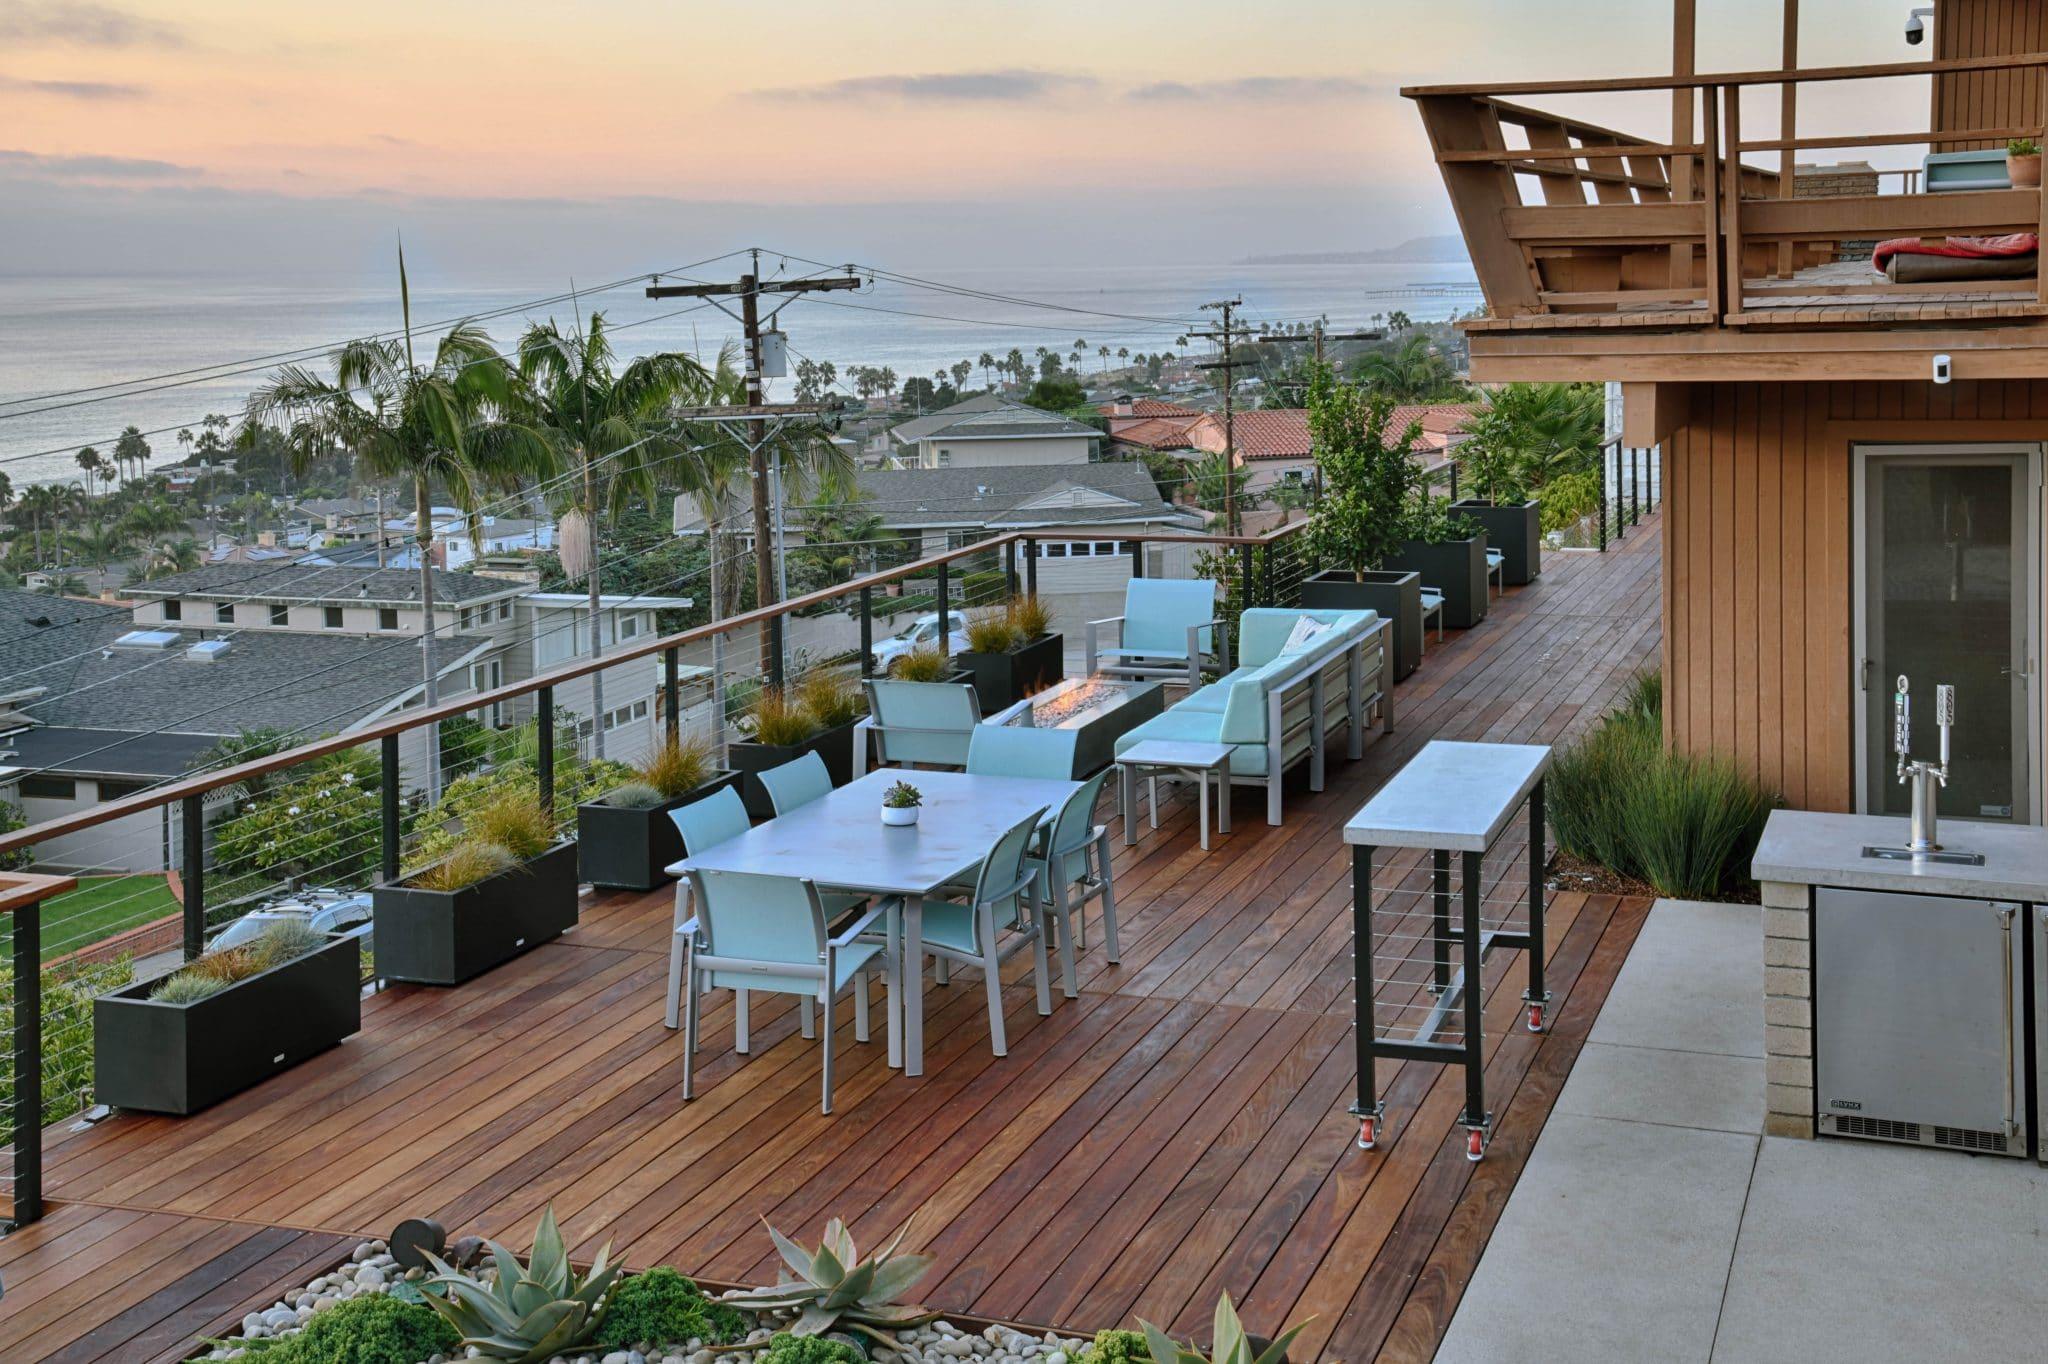 Rooftop deck in Sunset Cliffs